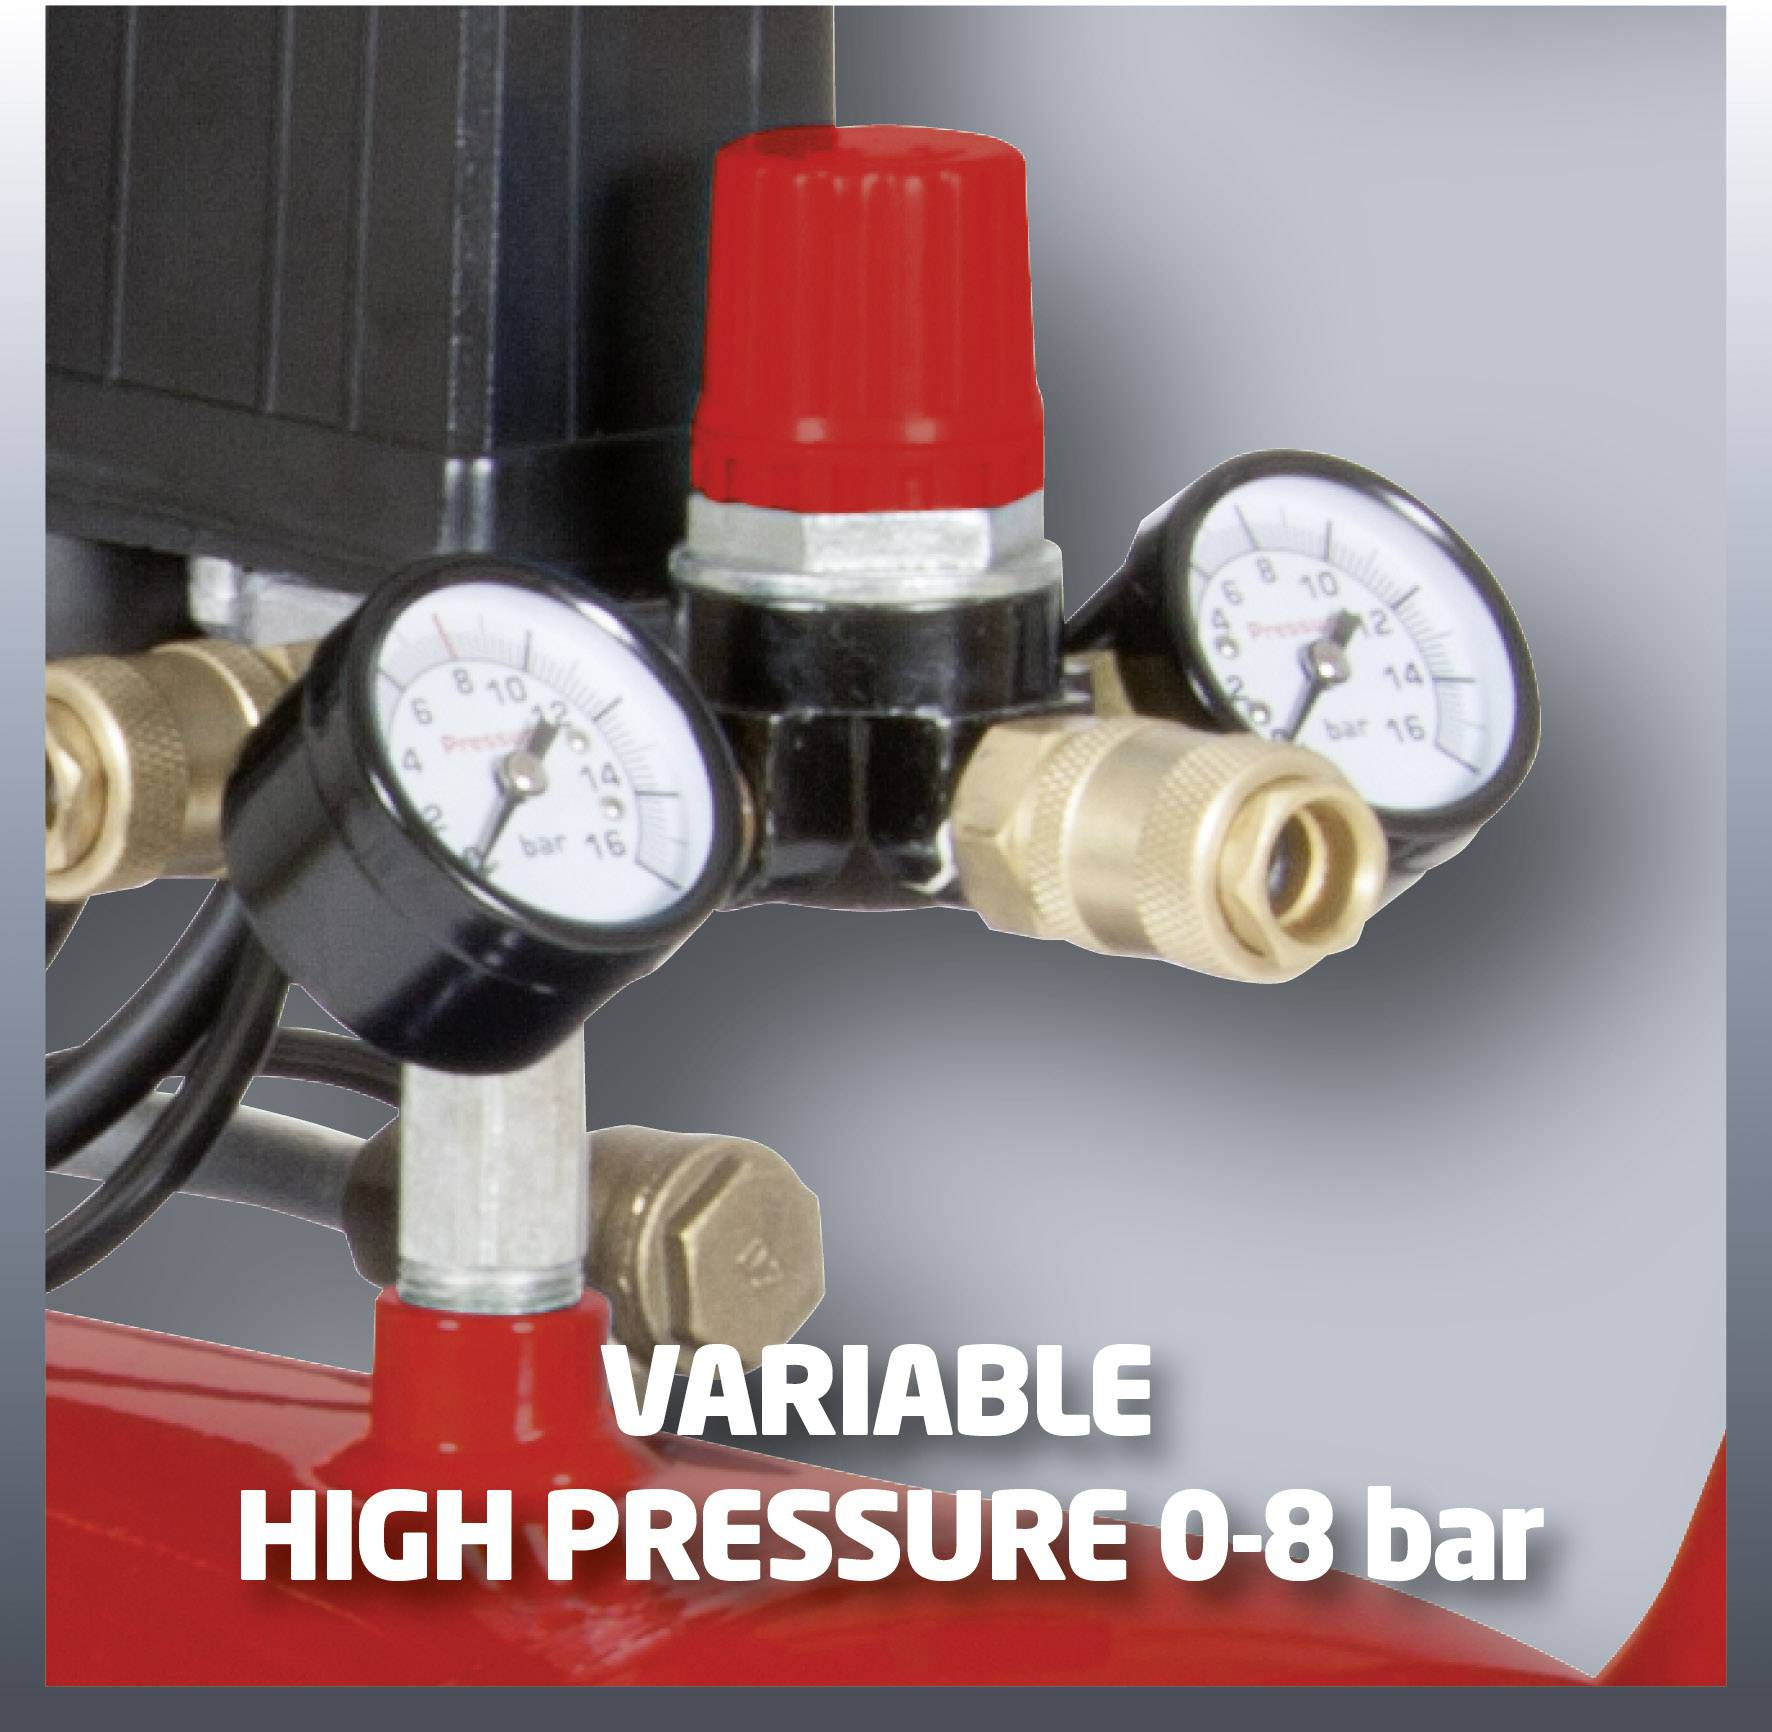 Piestový kompresor Einhell TC-AC 400/50/8 Kit 4010252, objem tlak. nádoby 50 l